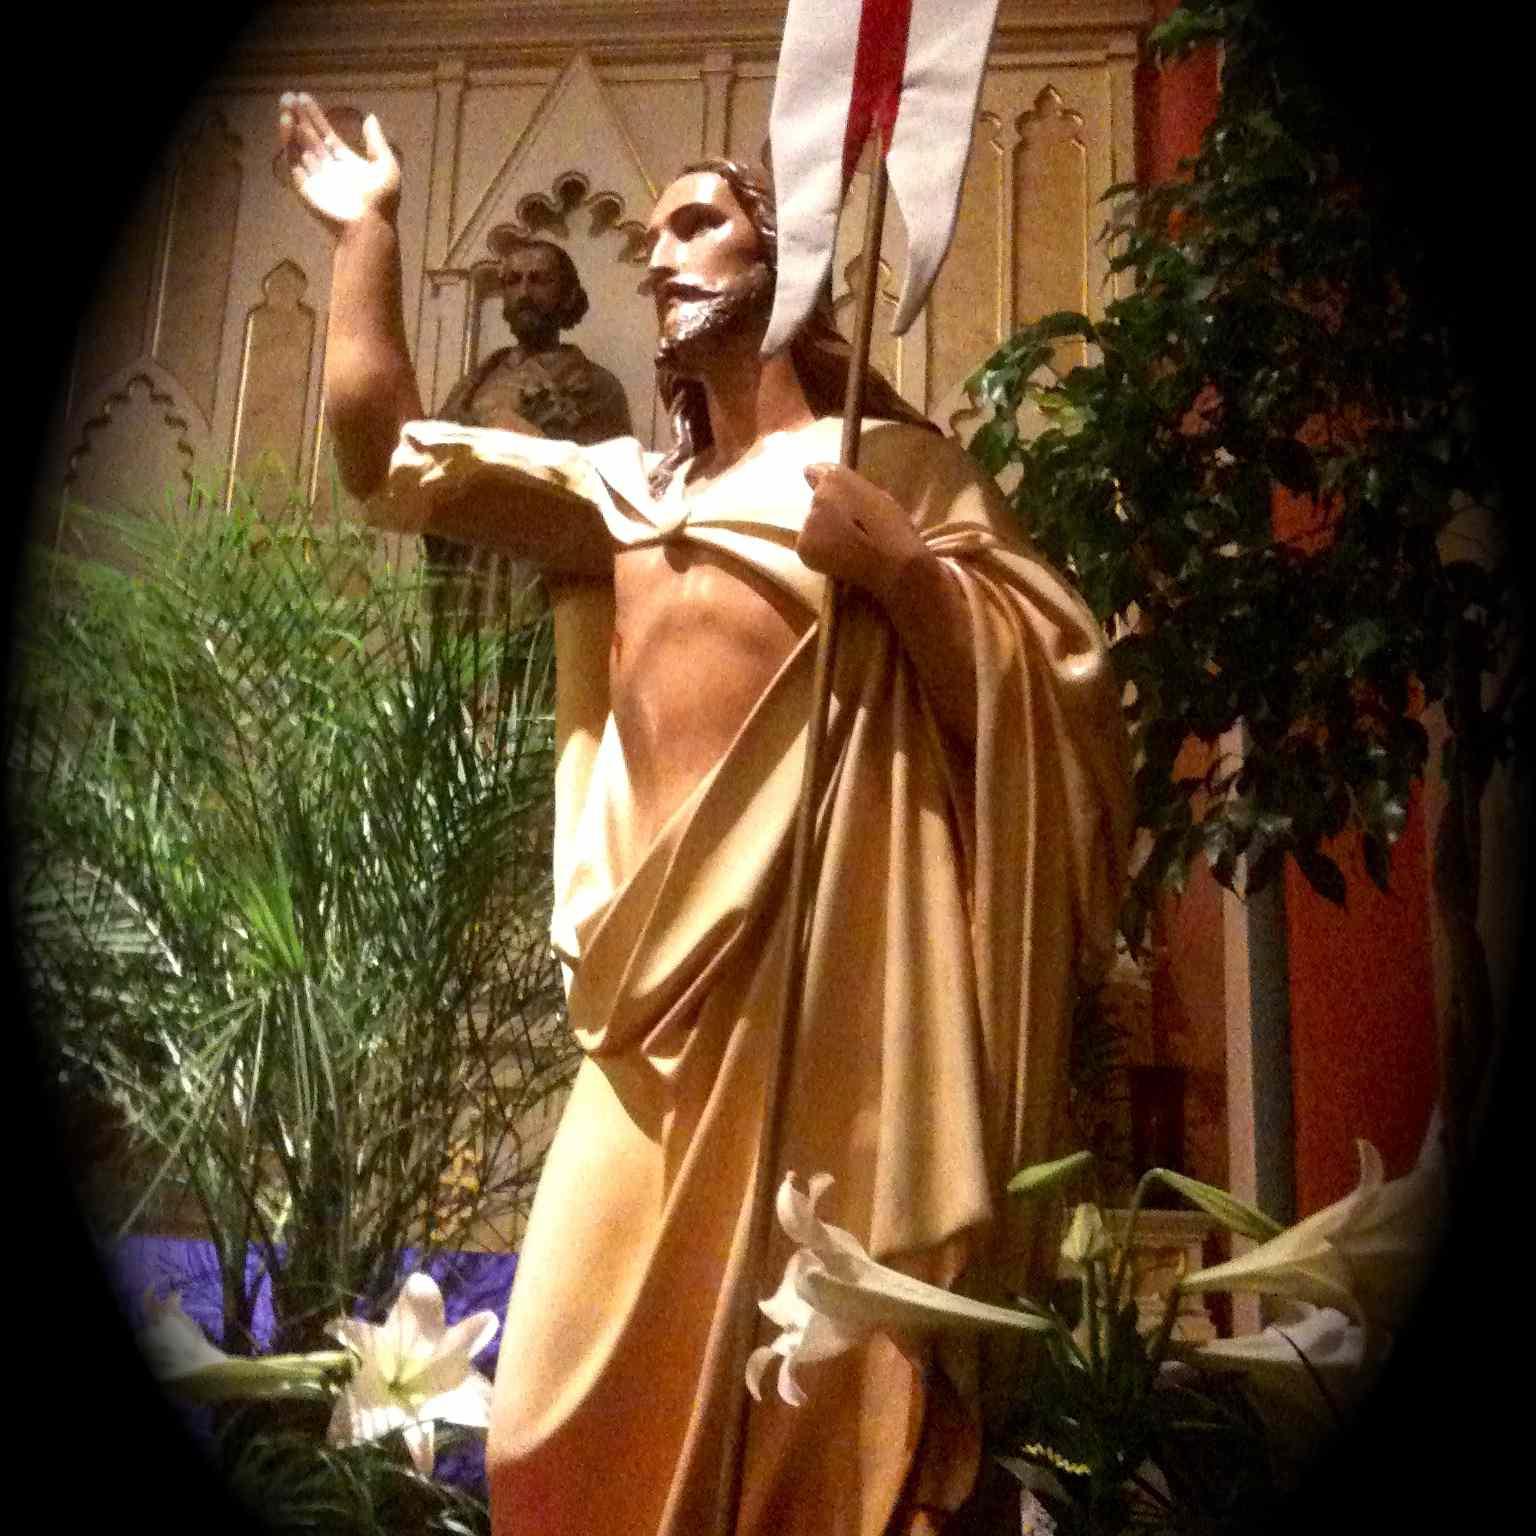 A statue of the risen Christ at Saint Mary Oratory, Rockford, Illinois. (Photo © Scott P. Richert)